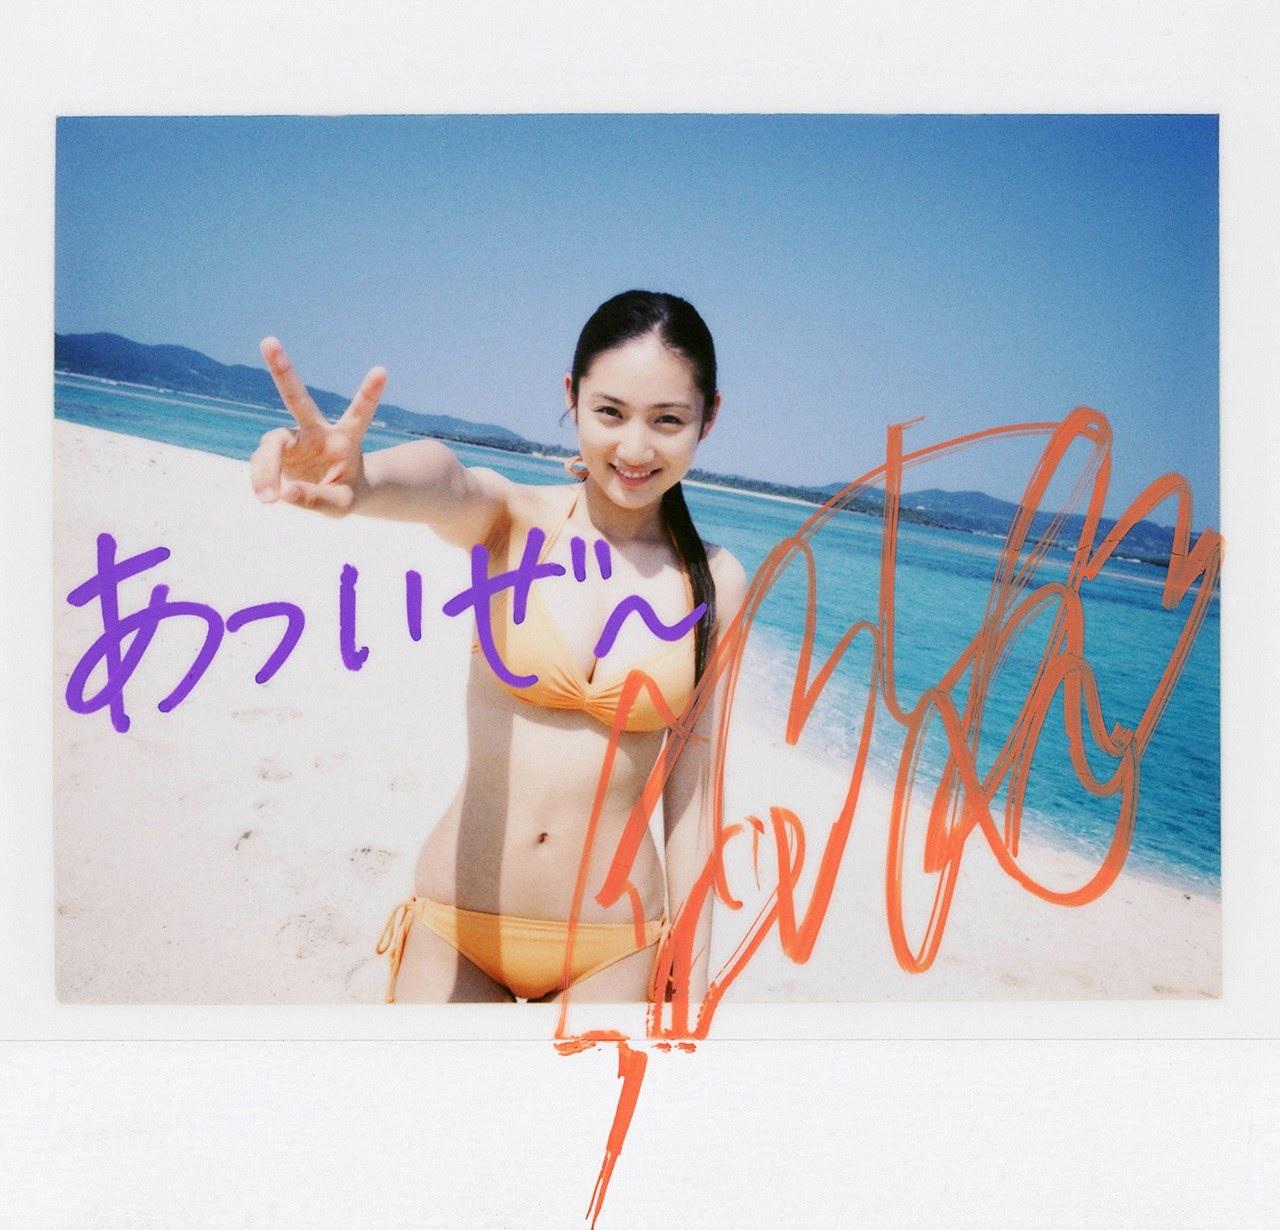 And on Kumejima the first experienceher late summer vacation begins! Saaya130